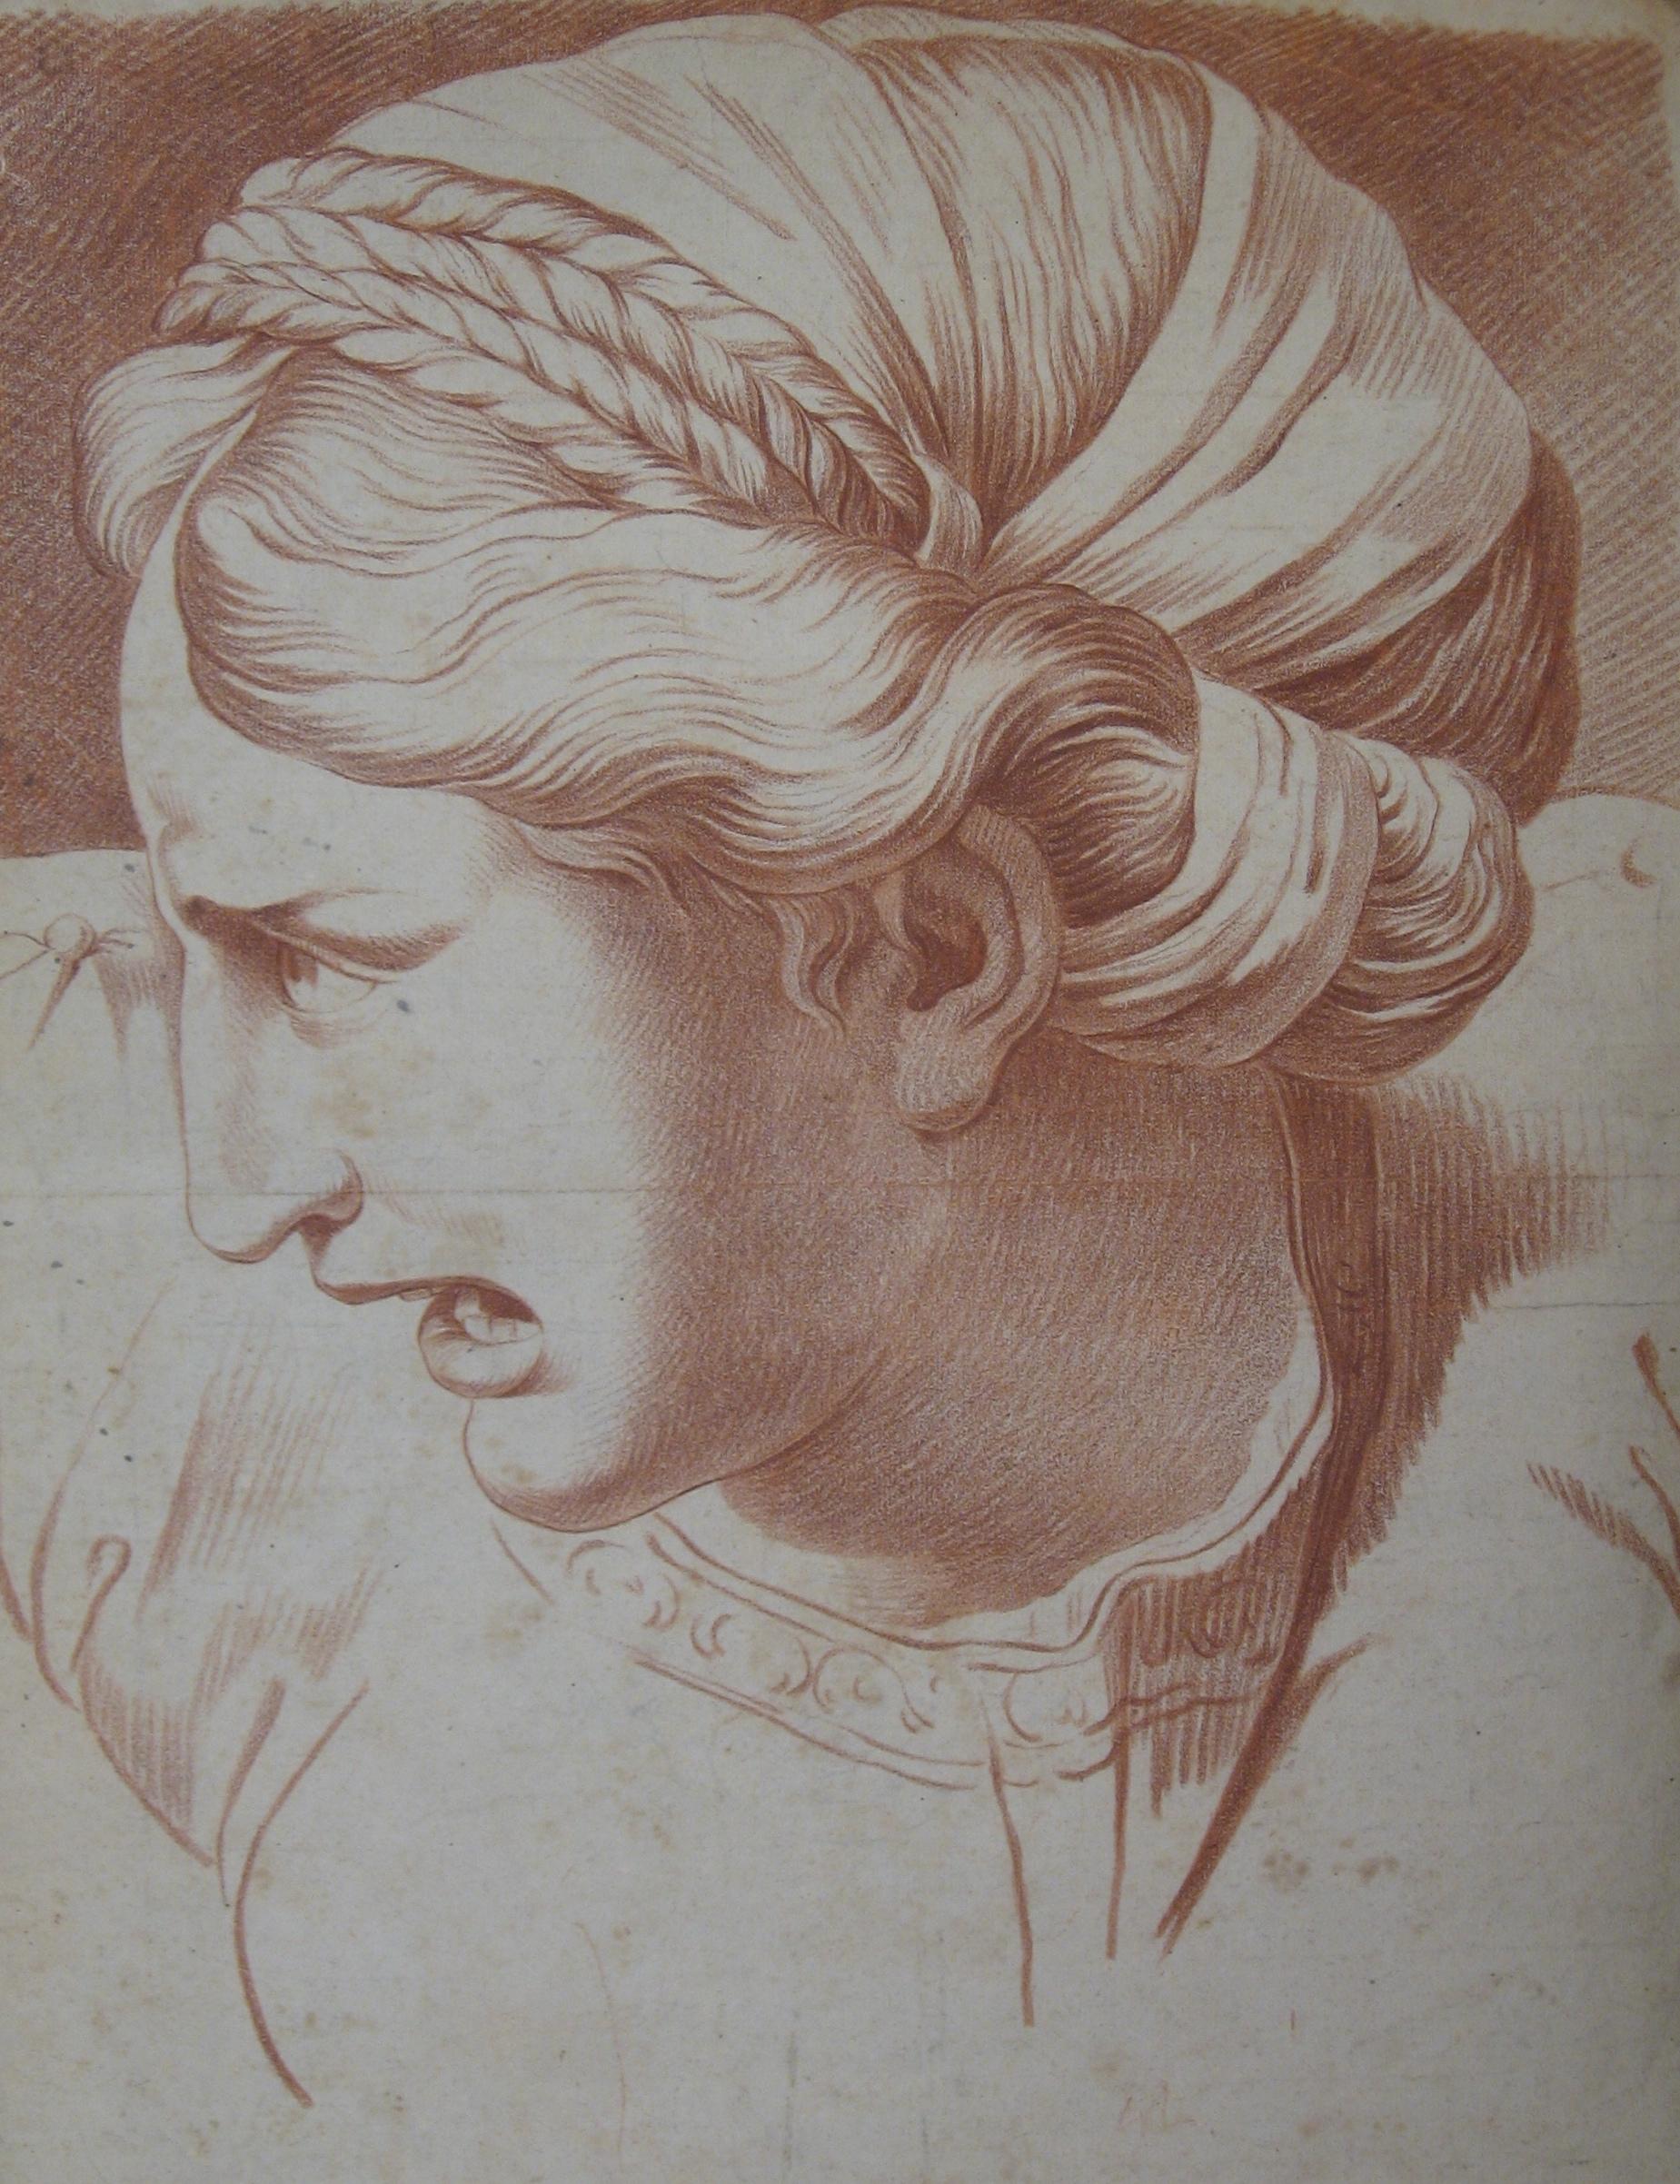 TITLE:Sibyl ou Sabine, L'École de David Year: c. 1730 Medium: Red chalk drawing Image size: 15 ¾ x 20 ½